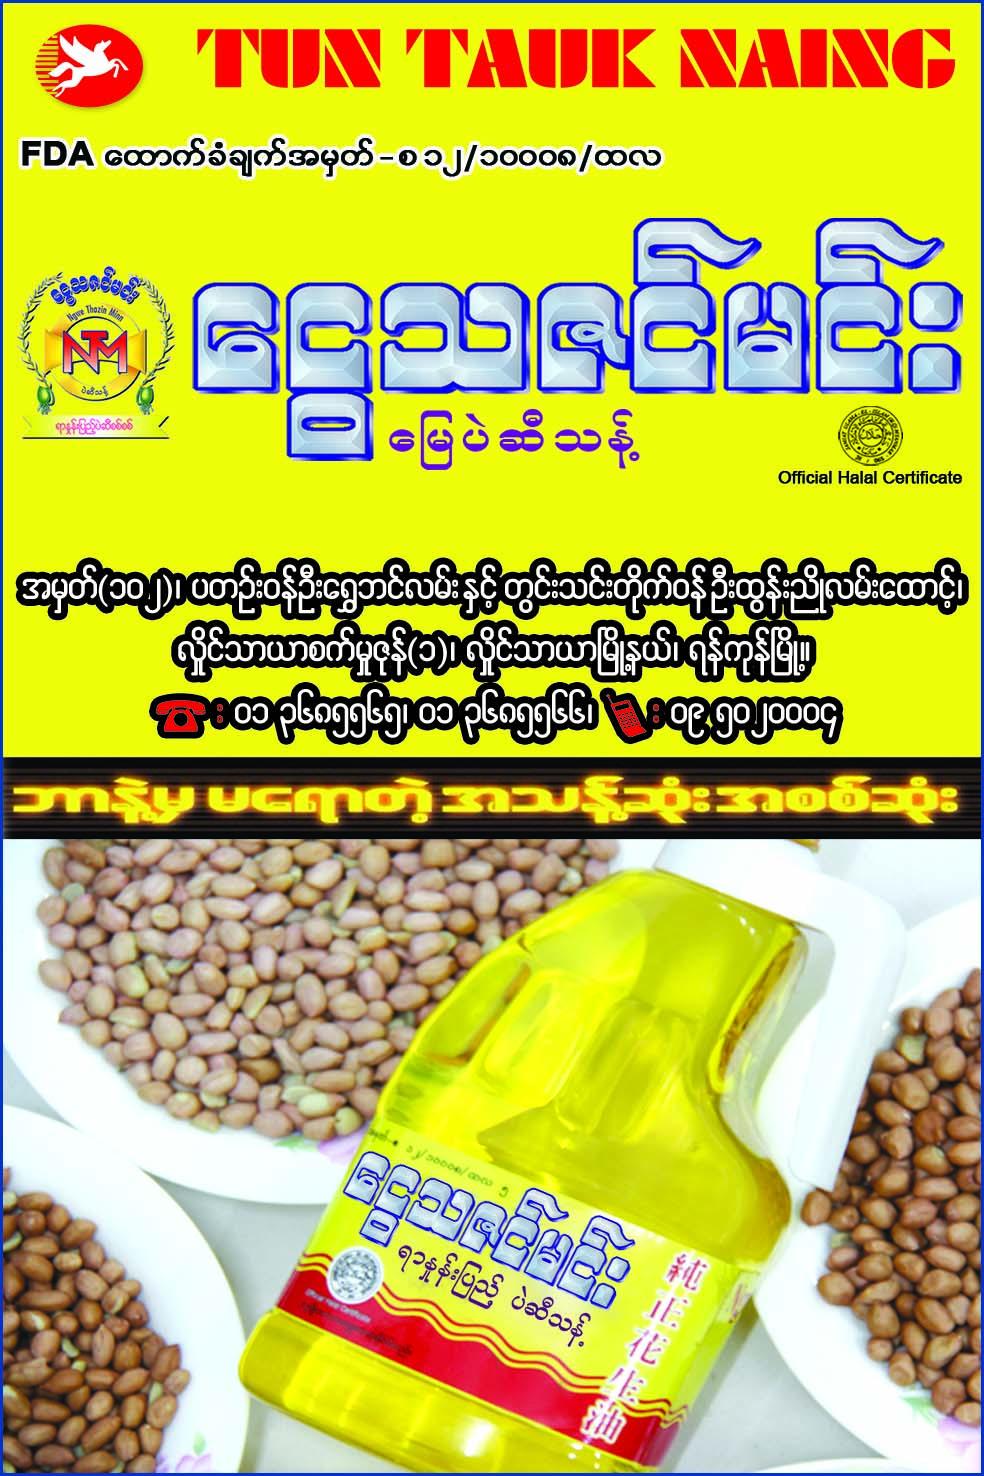 2018/Yangon/MBDL/Tun-Tauk-Naing-Co-Ltd-(Ngwe-Thazin-Min)_Cooking-Oil_(A)_1164.jpg